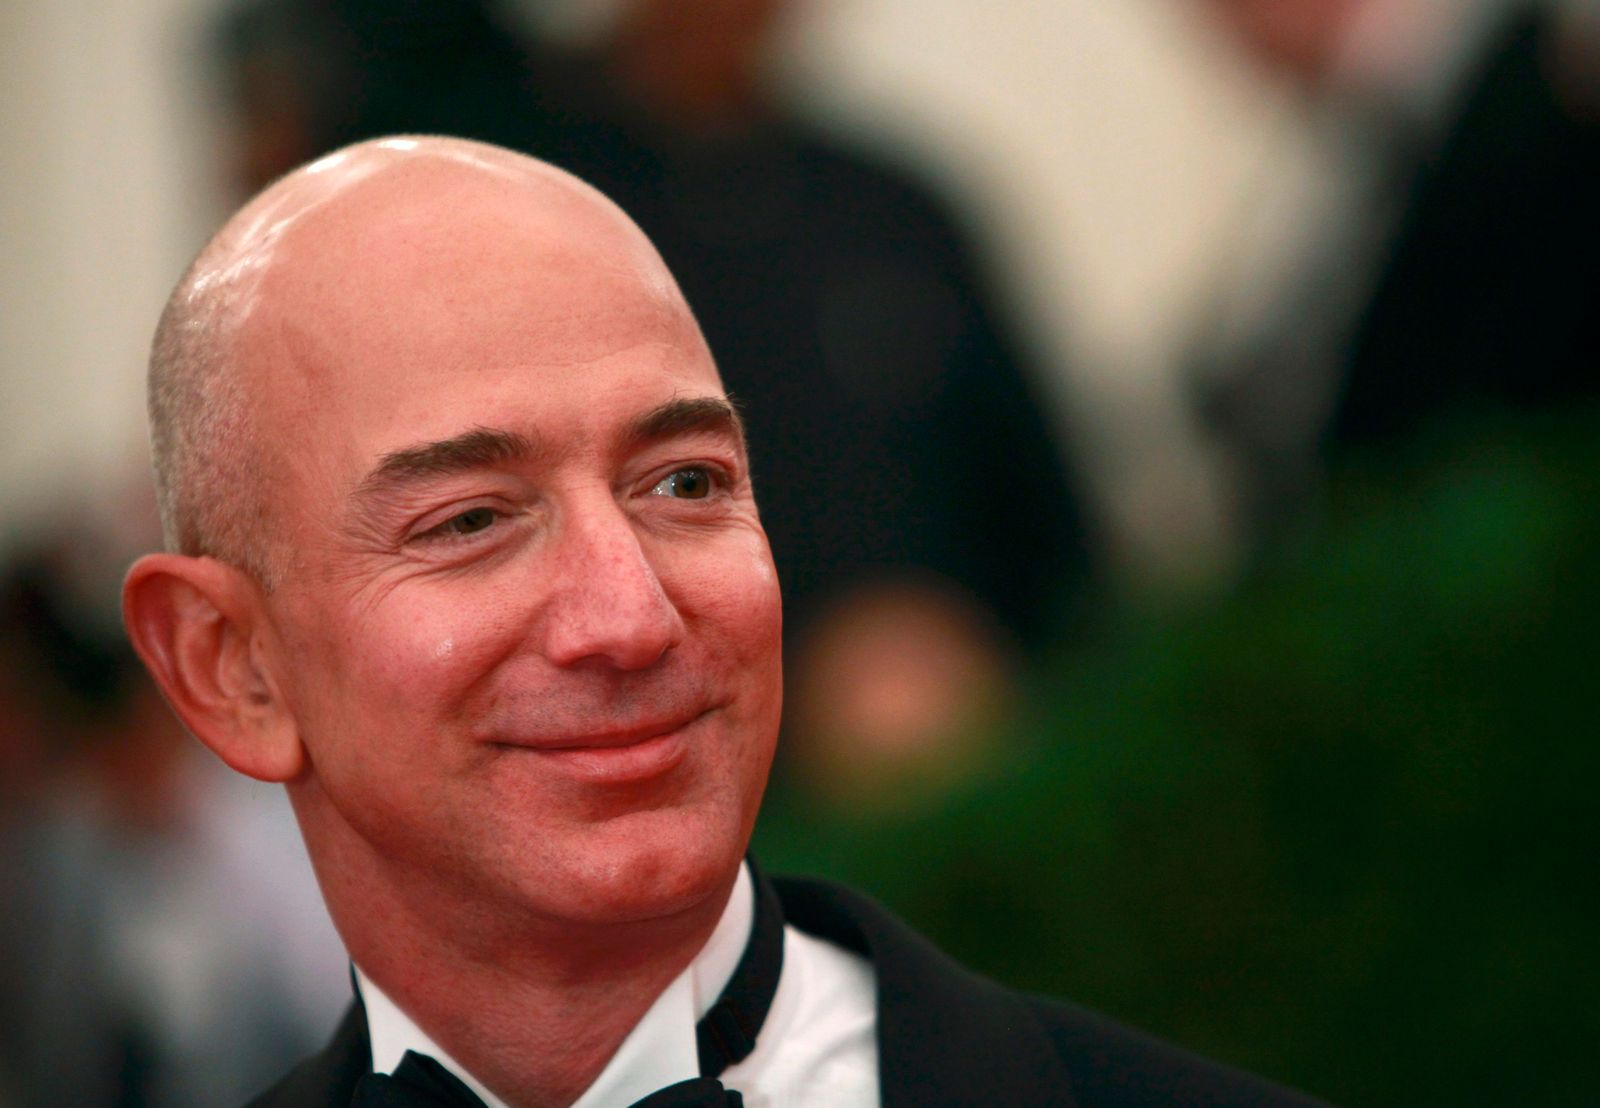 Amazon CEO Jeff Bezos arrives at the Metropolitan Museum of Art Costume Institute Benefit in New York